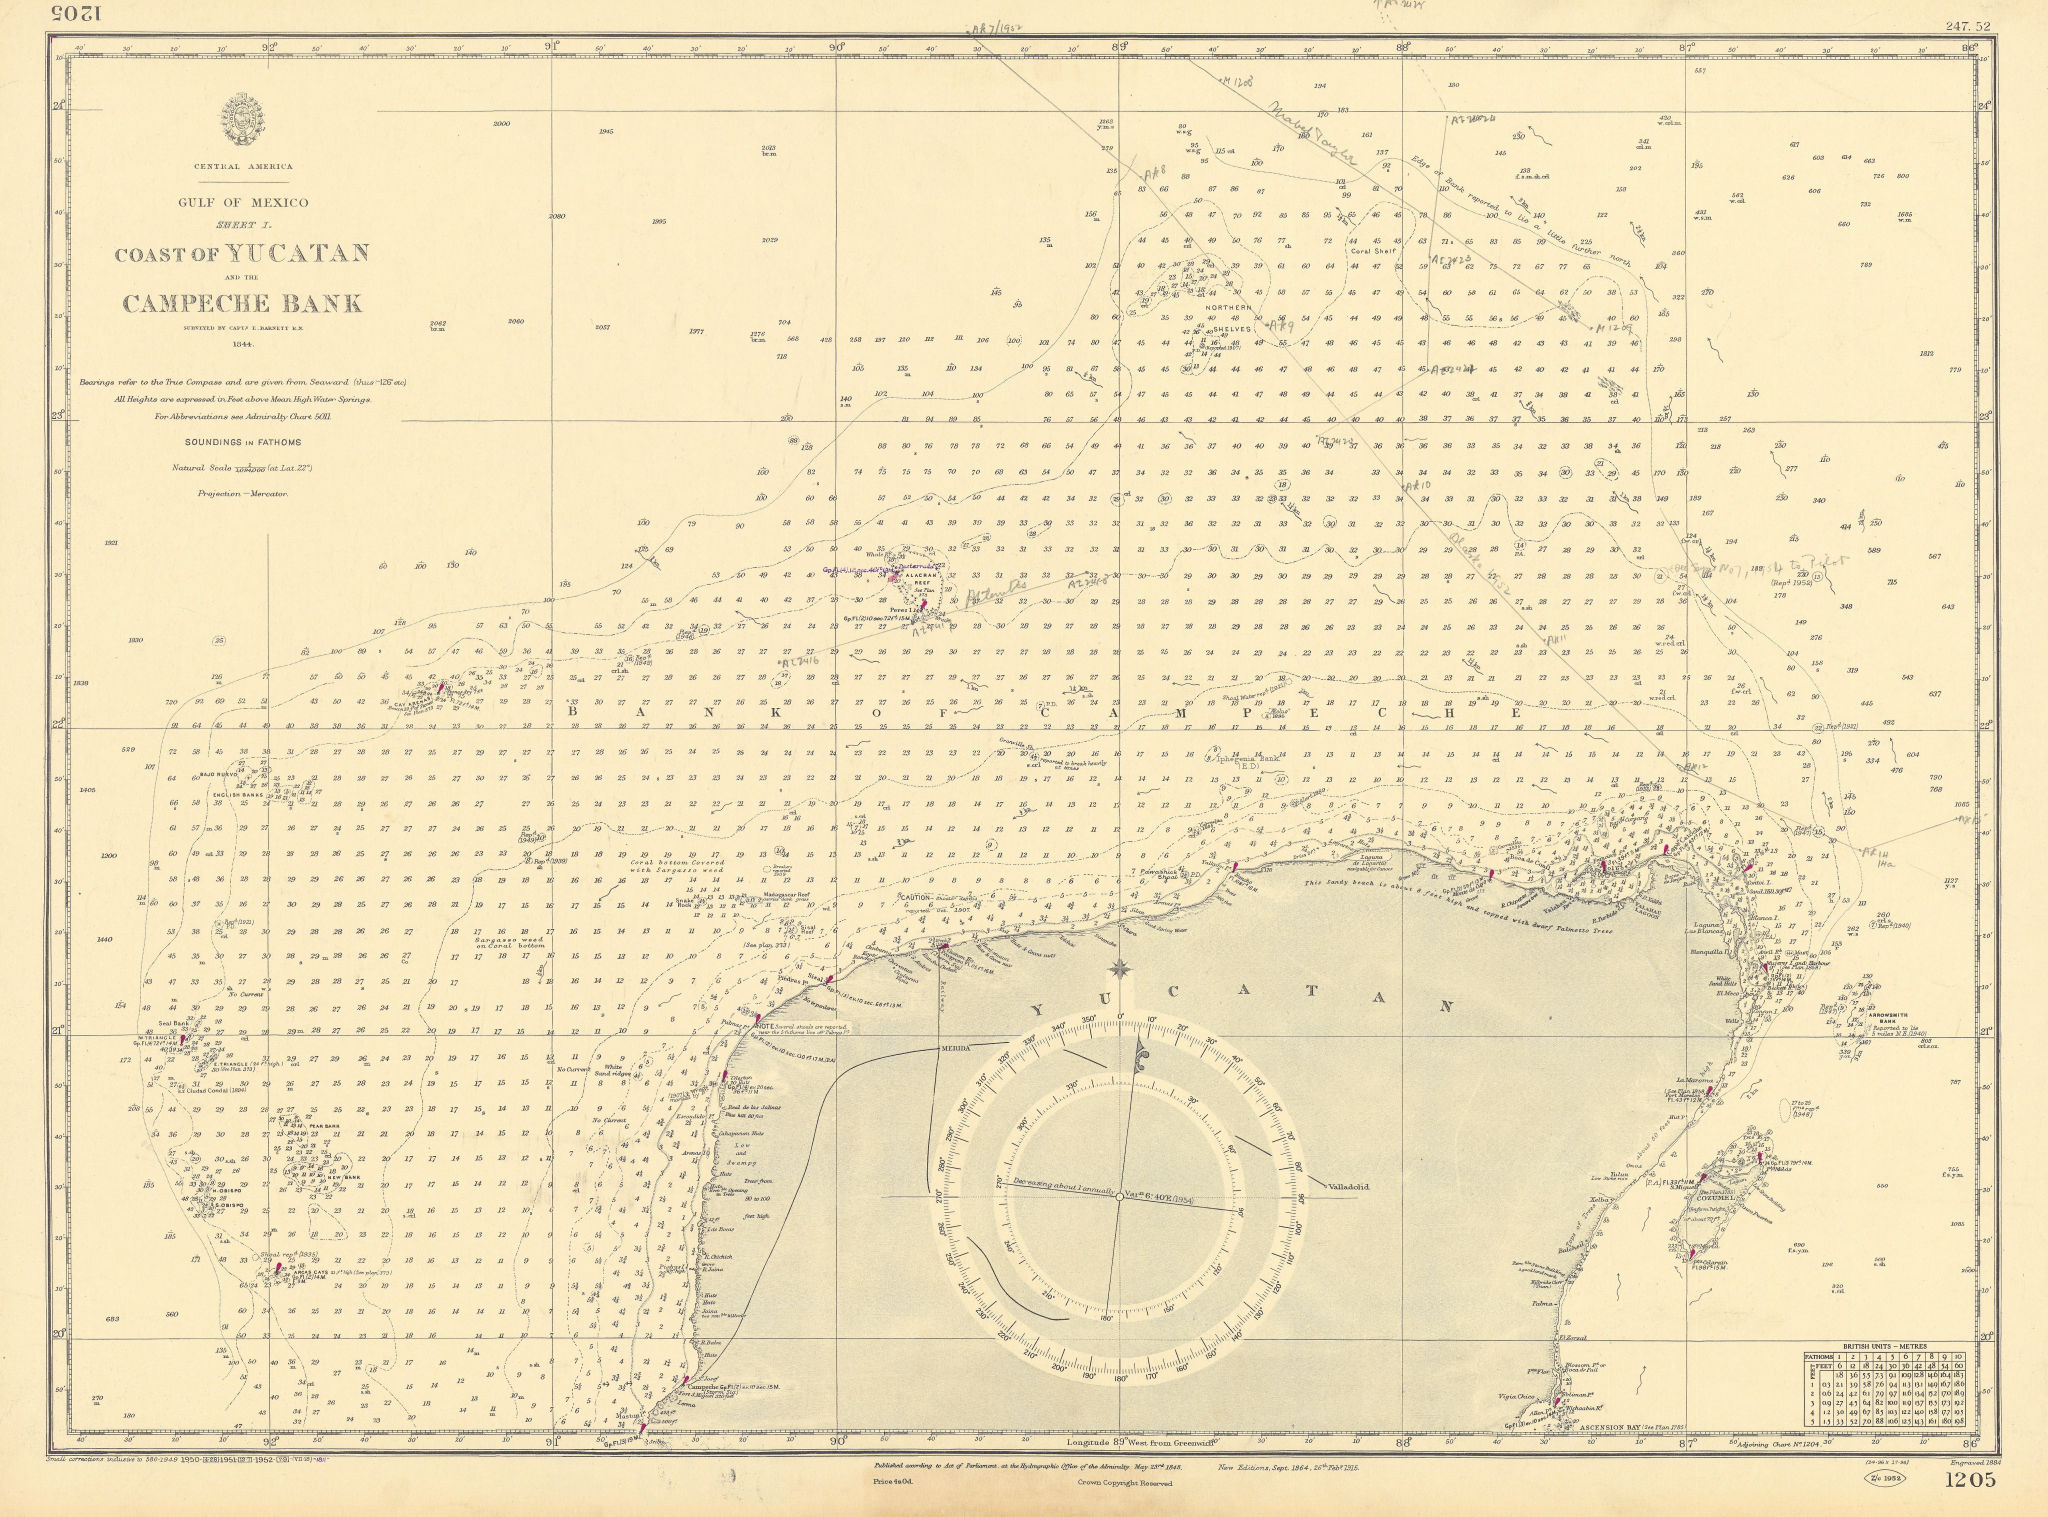 North Yucatan coast Campeche Bank Cozumel Cancun ADMIRALTY chart 1848 (1952) map